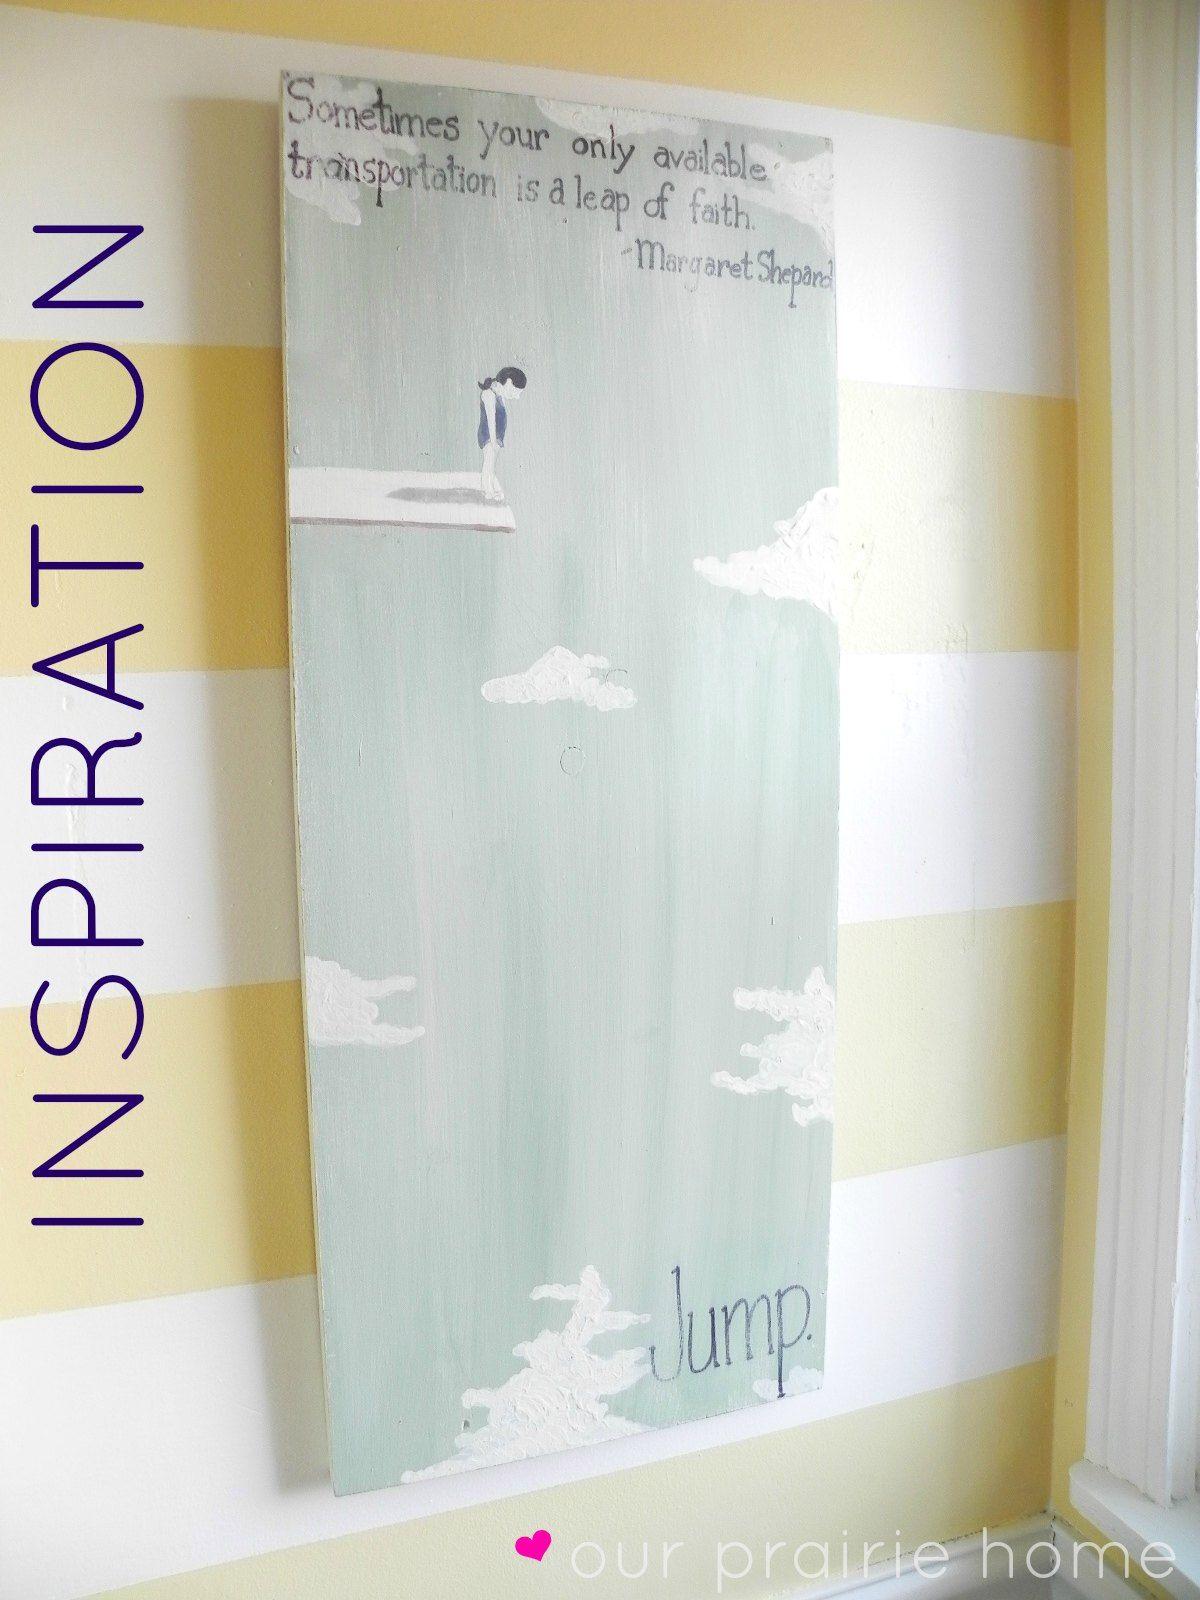 Our Prairie Home: Downstairs Bathroom {A Reveal} Inspirational Wall ...